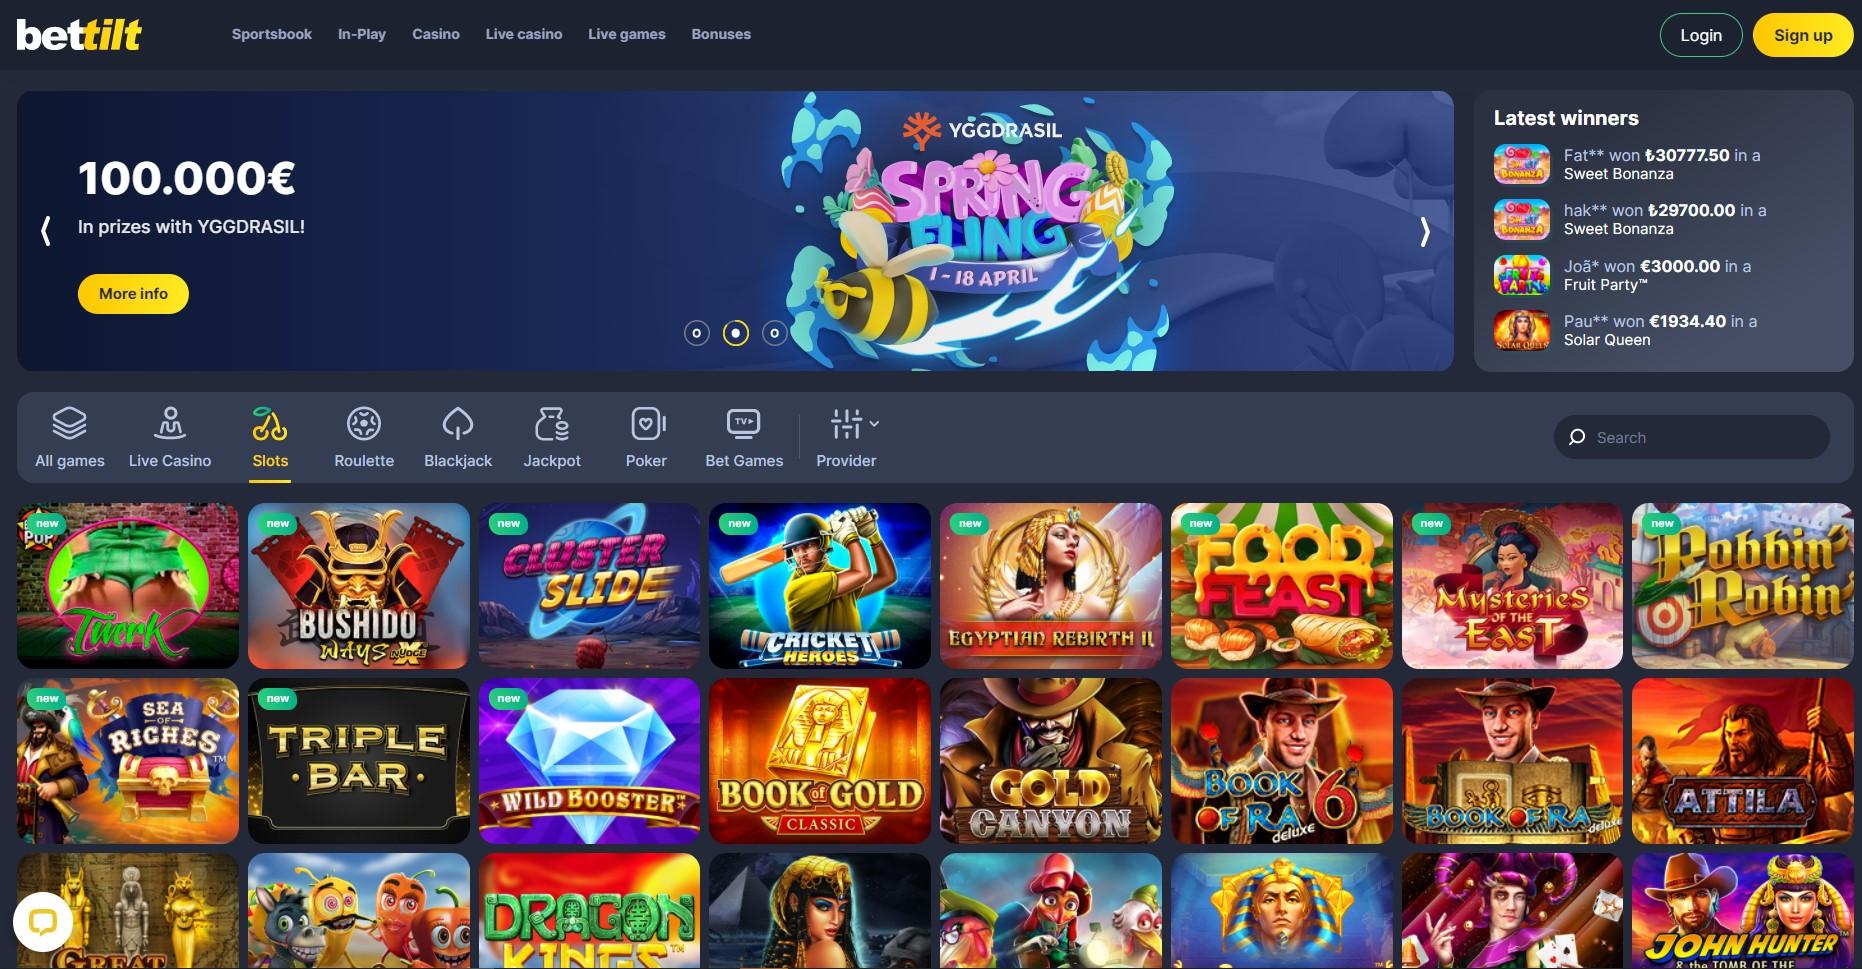 Bettilt casino slot games